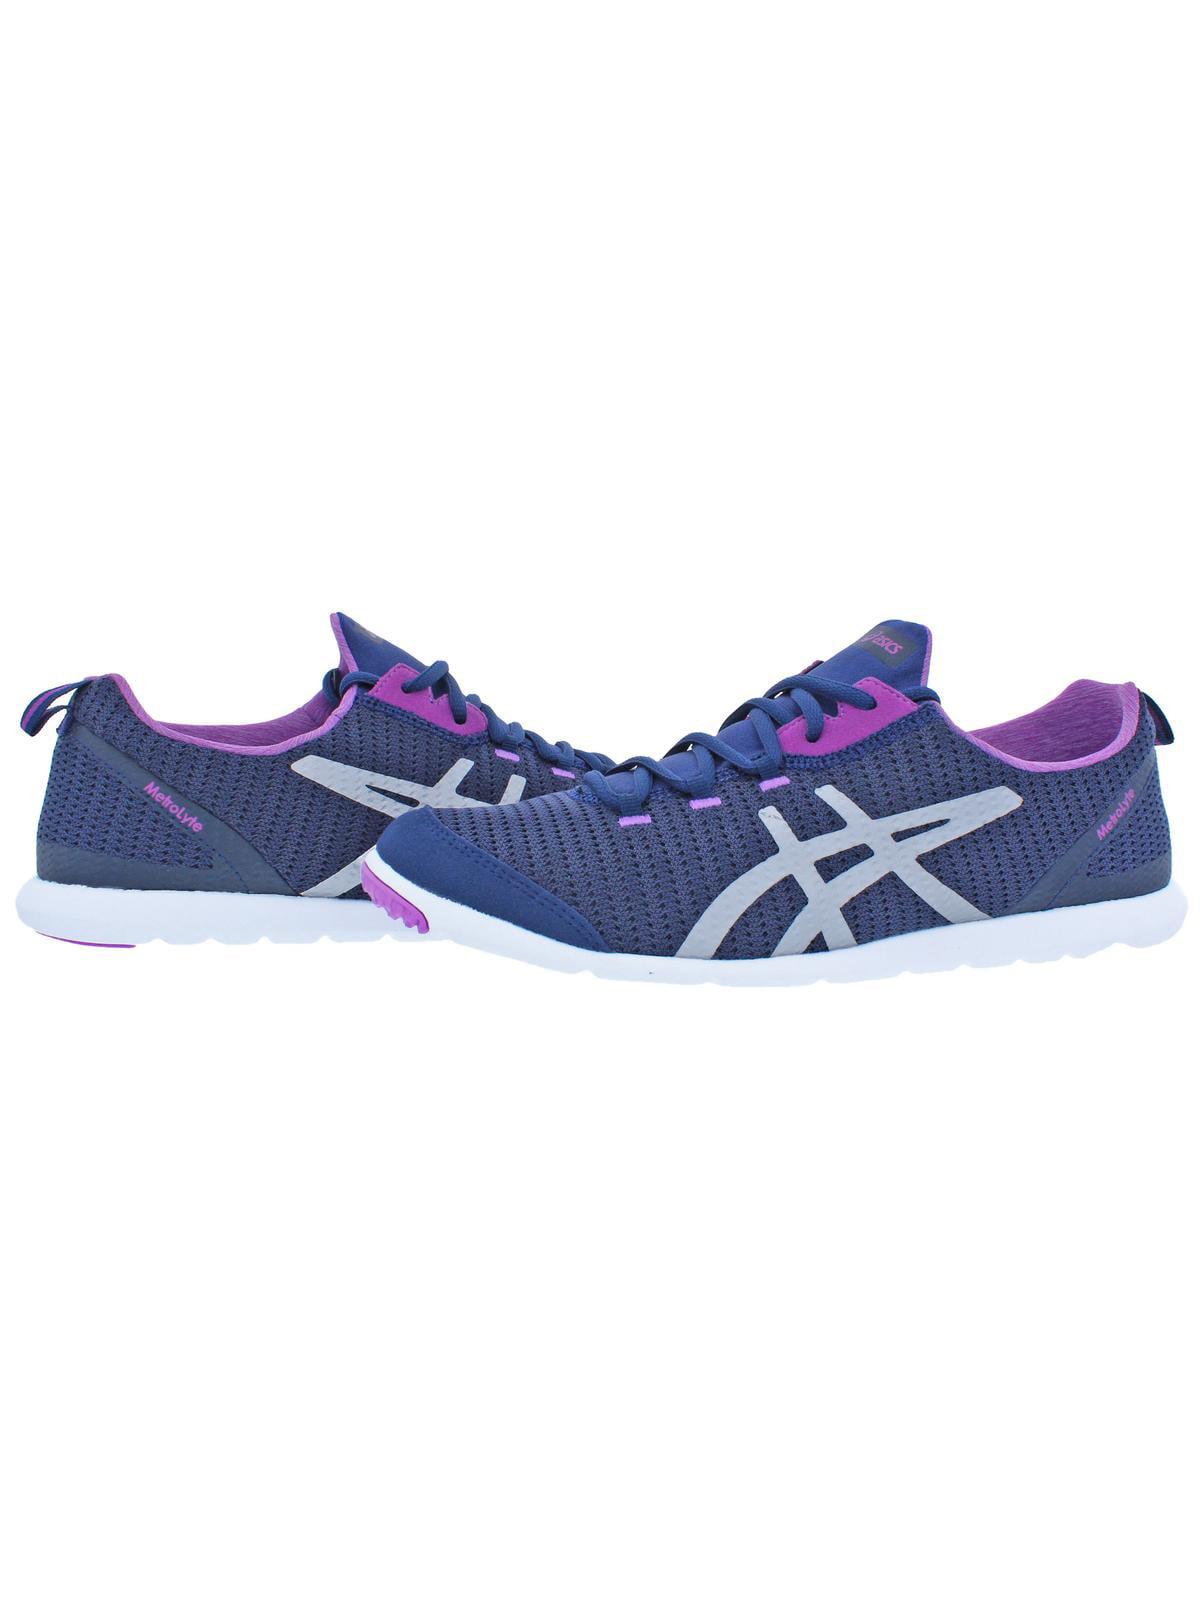 Asics Womens Metrolyte MONO-SOCK Lightweight Walking Shoes